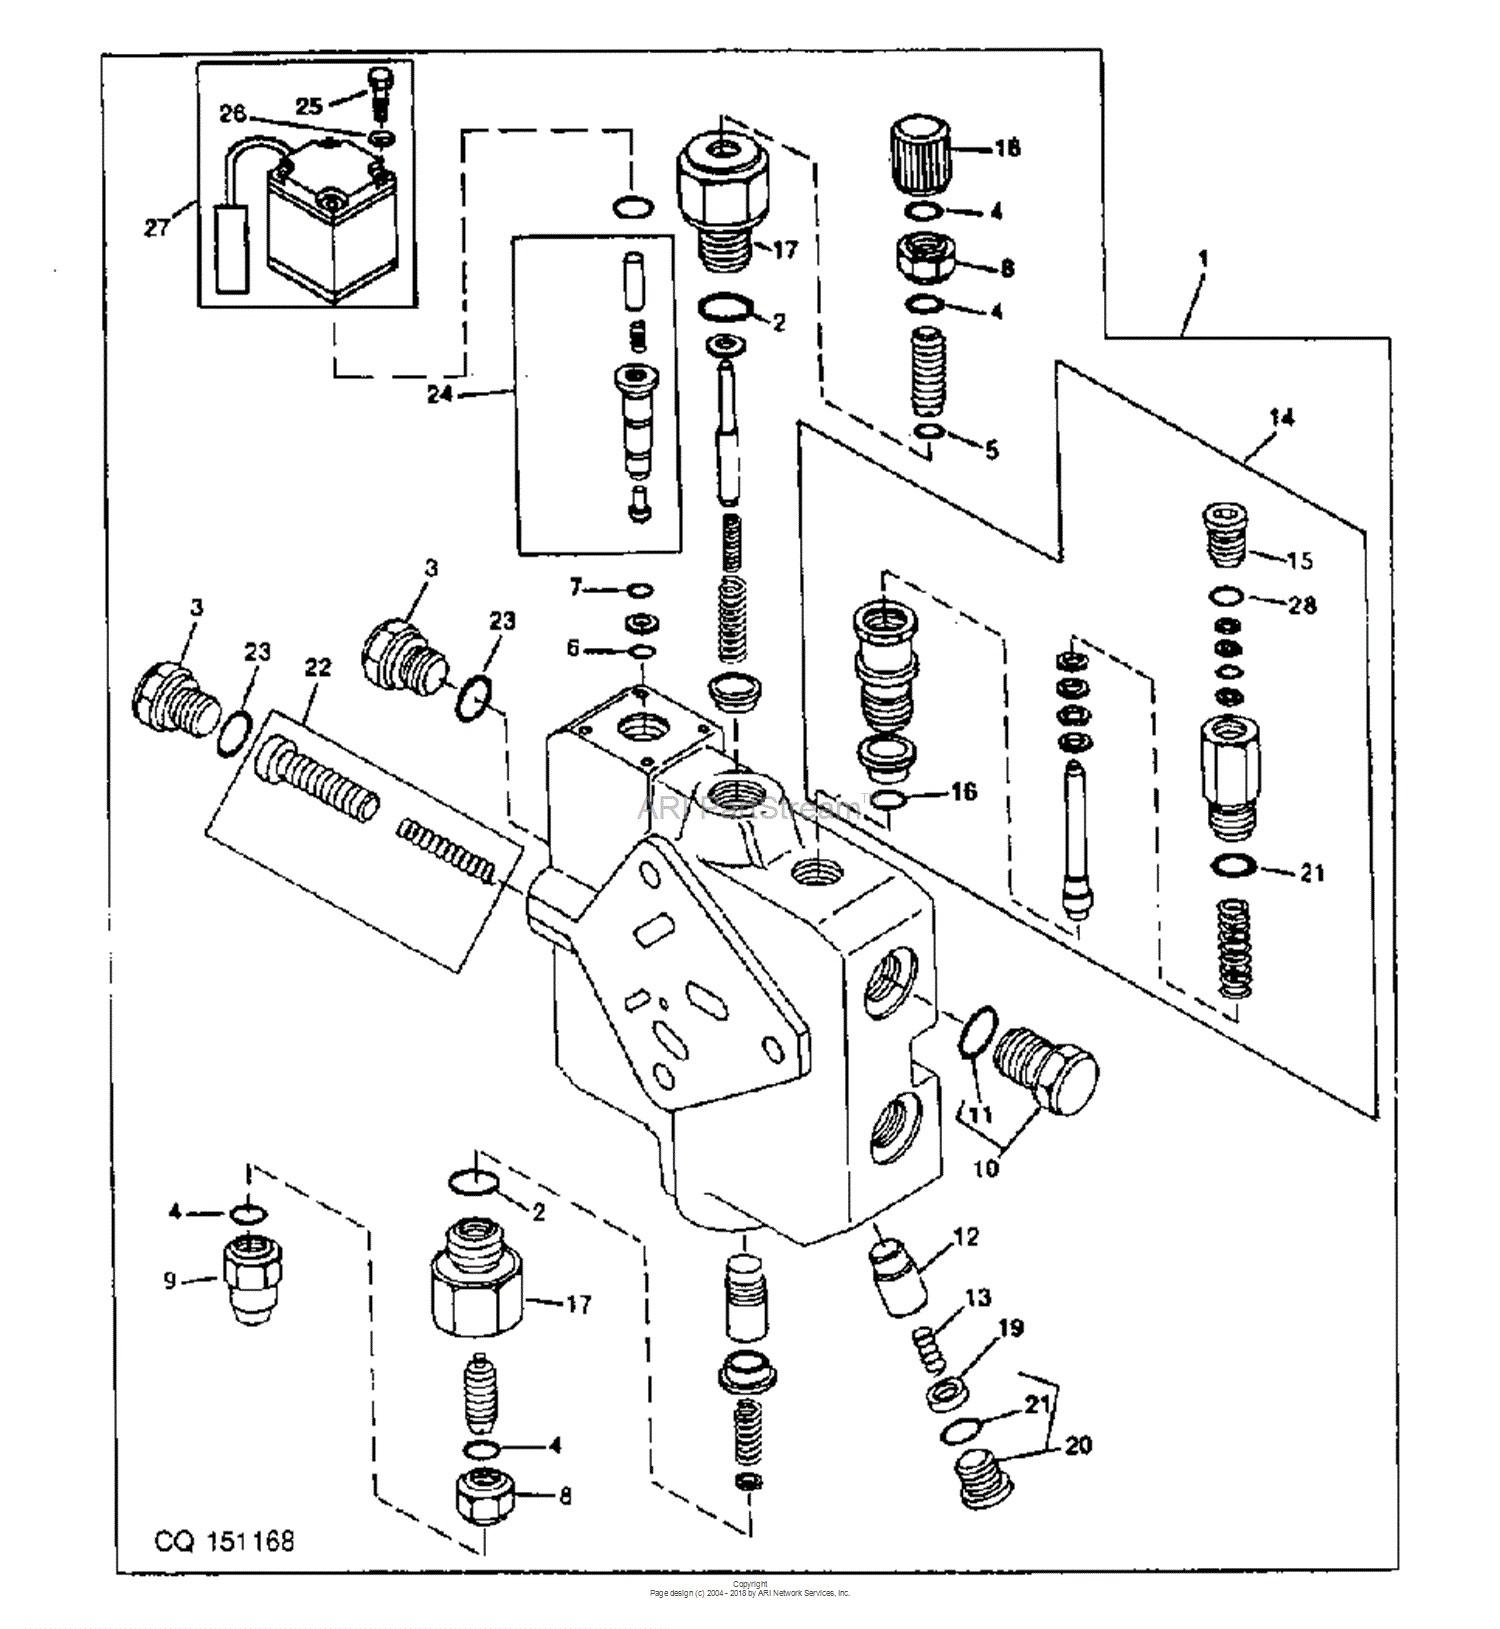 John Deere 2 Cylinder Engine Diagram John Deere Parts Diagrams John Deere 7500 Tractor south America Of John Deere 2 Cylinder Engine Diagram